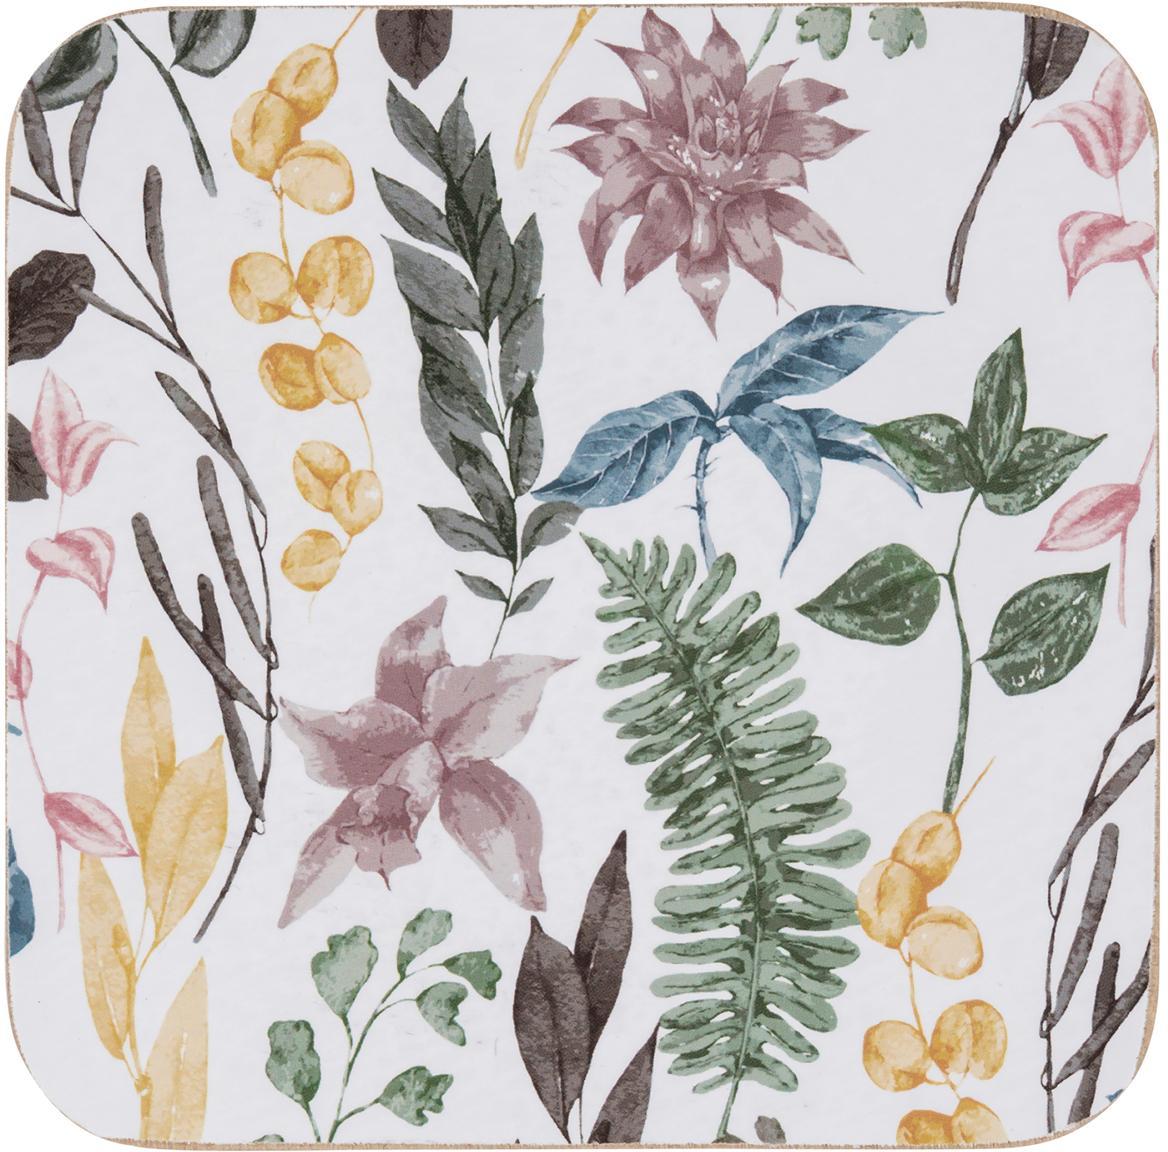 Sottobicchieri Summerfield 4 pz, Retro: sughero, Bianco, multicolore, Larg. 10 x Prof. 10 cm